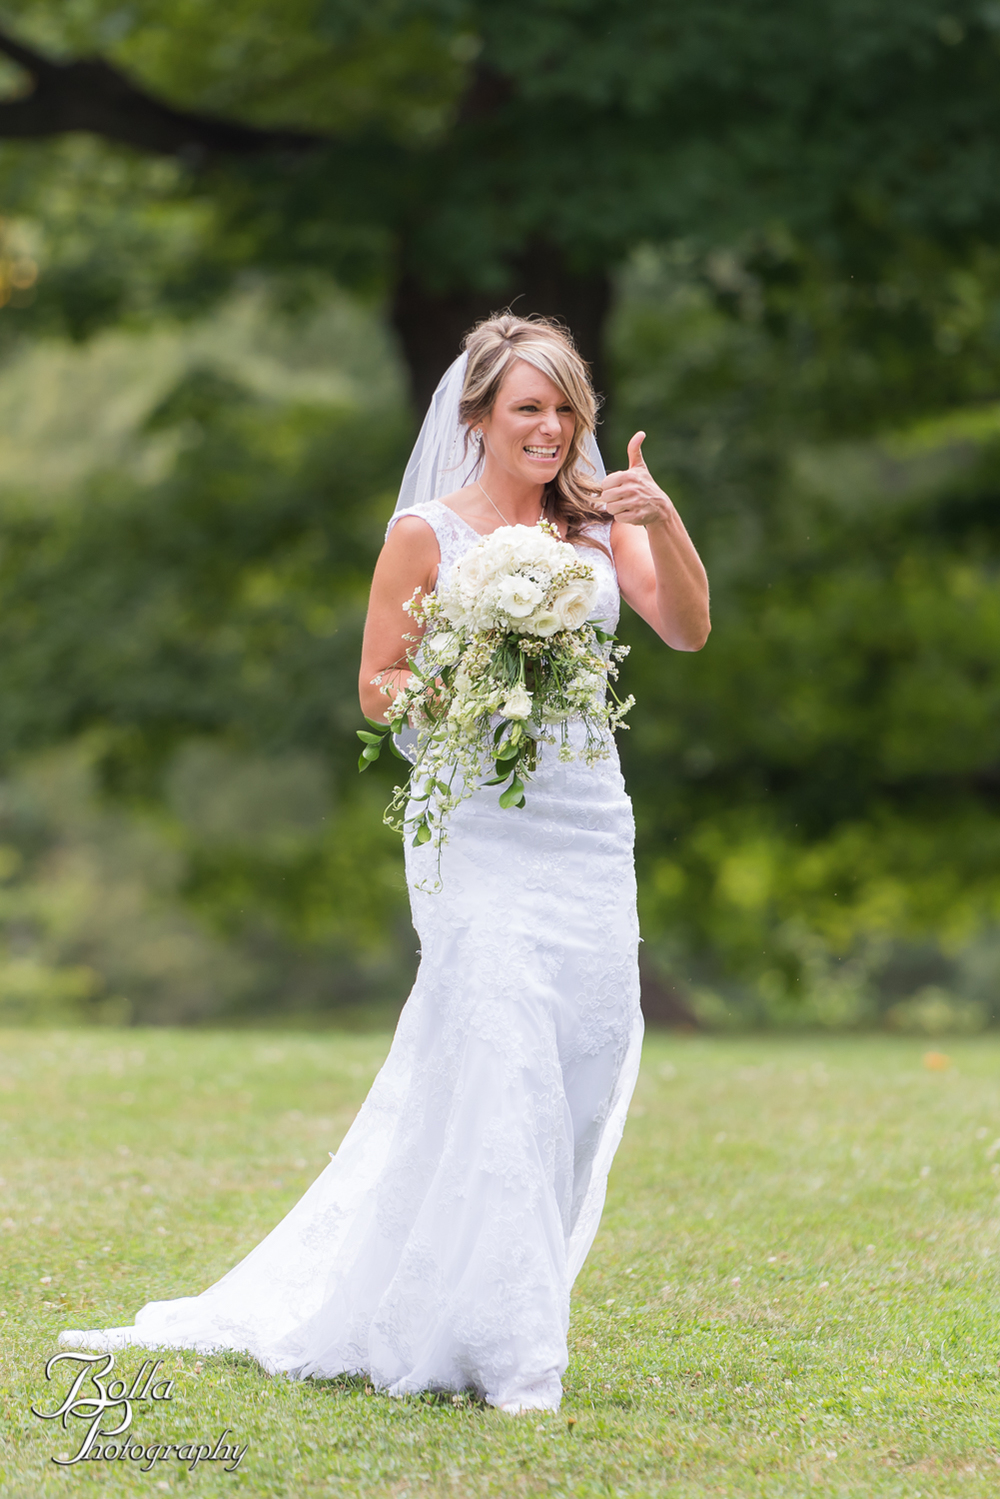 Bolla_Photography_St_Louis_wedding_photographer-0093.jpg